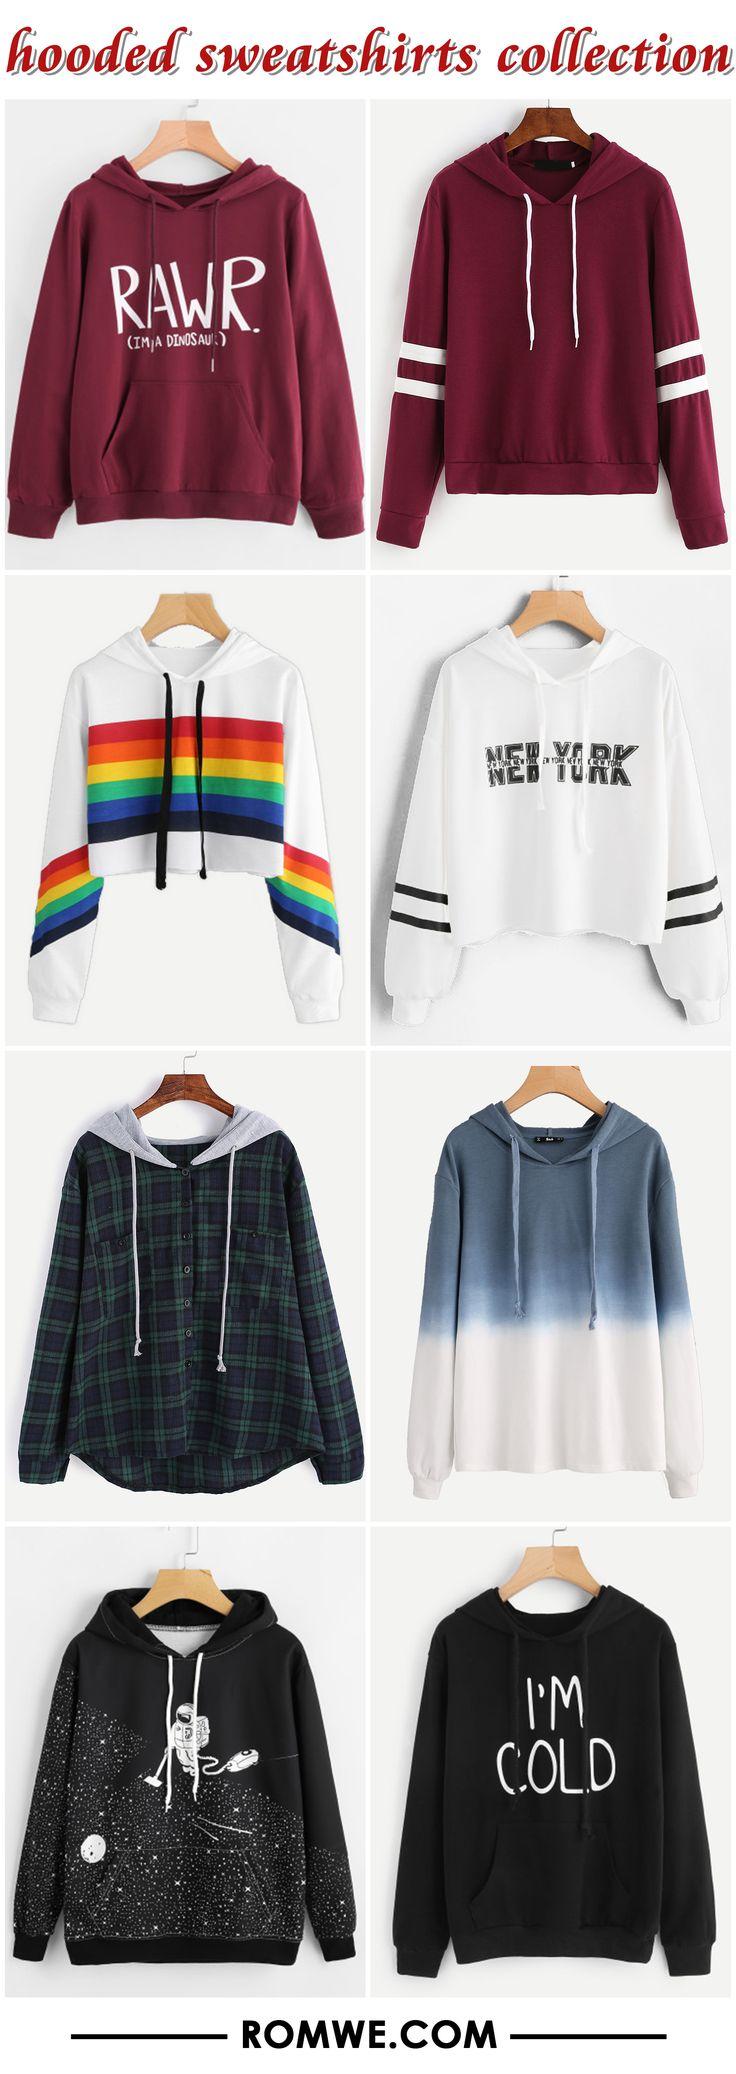 hooded sweatshirts collection 2017 - romwe.com